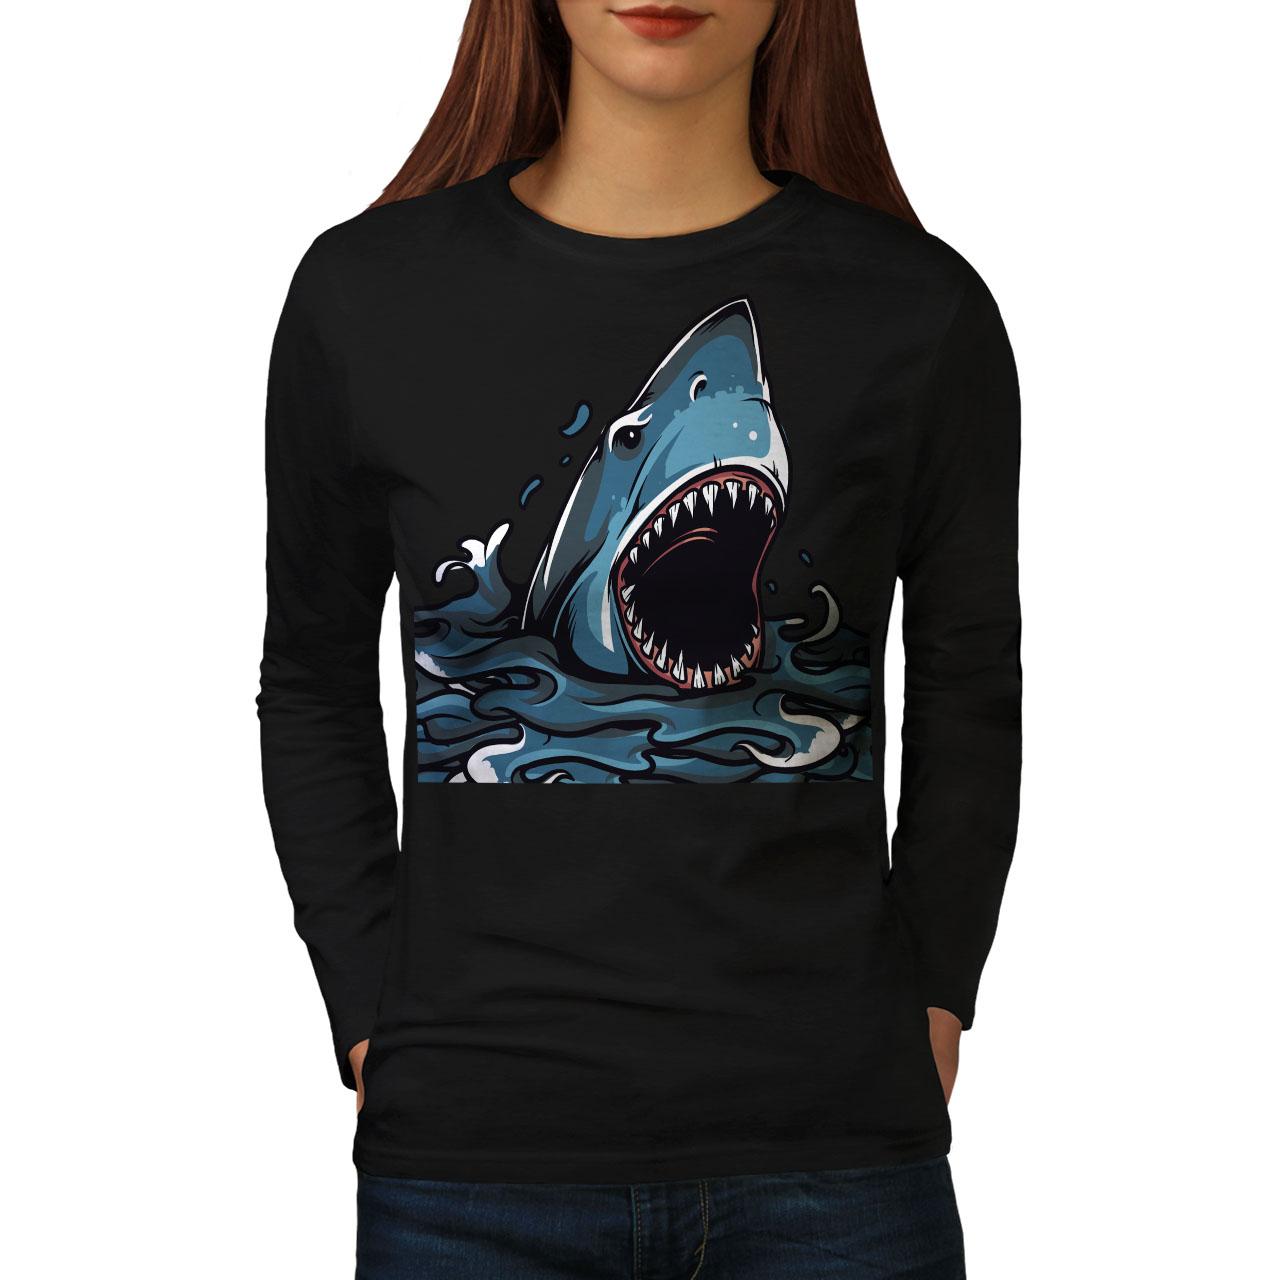 Shark Mandíbulas Animal Aterrador Para Mujeres De Manga Larga T-shirt New | Wellcoda